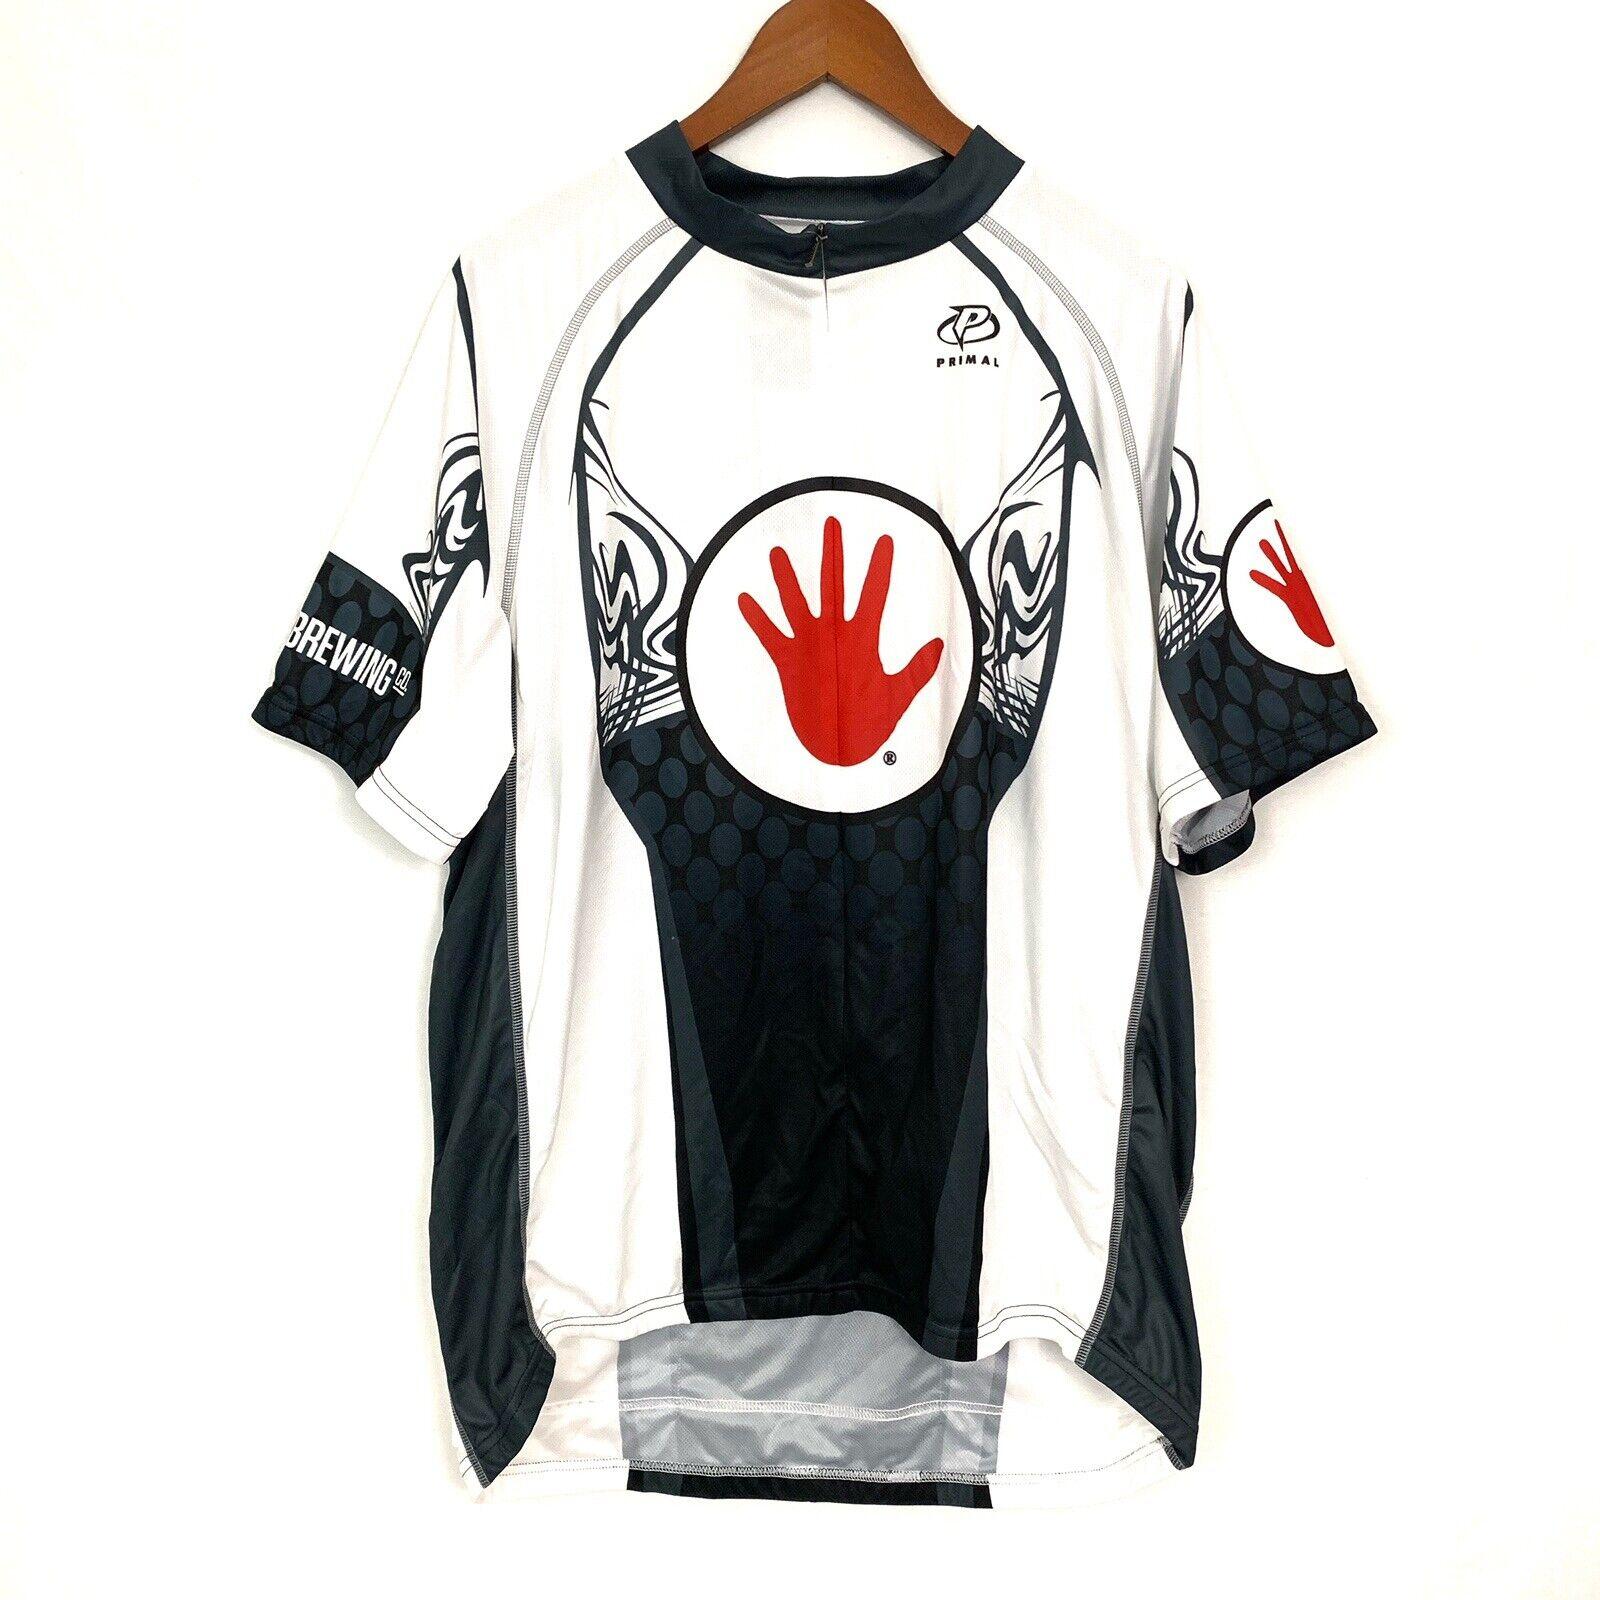 NWT  Primal Wear LEFT HAND Team Sport Cut Men's CYCLING Jersey, Sz 3XL PROSENSOR